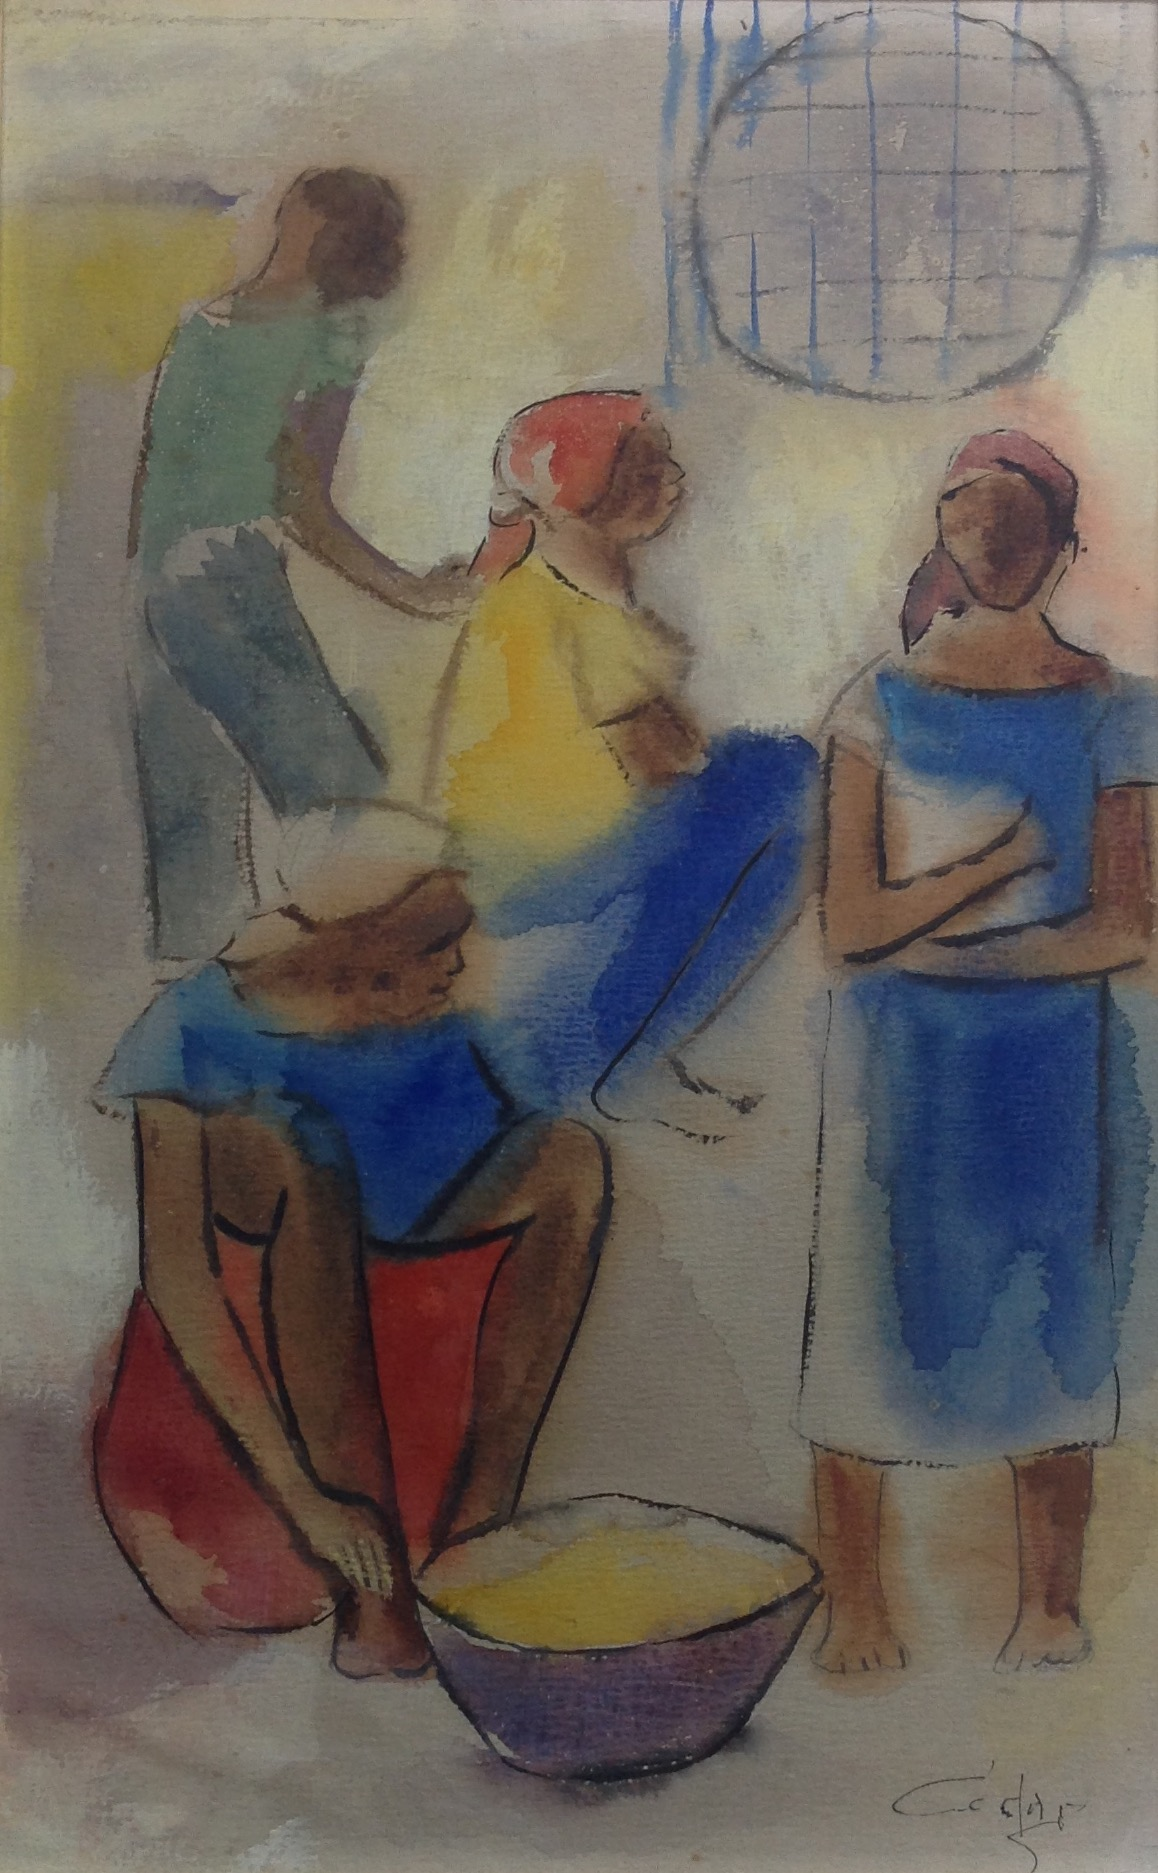 Dieudonne Cedor 12X18 #194-3-96 dessin